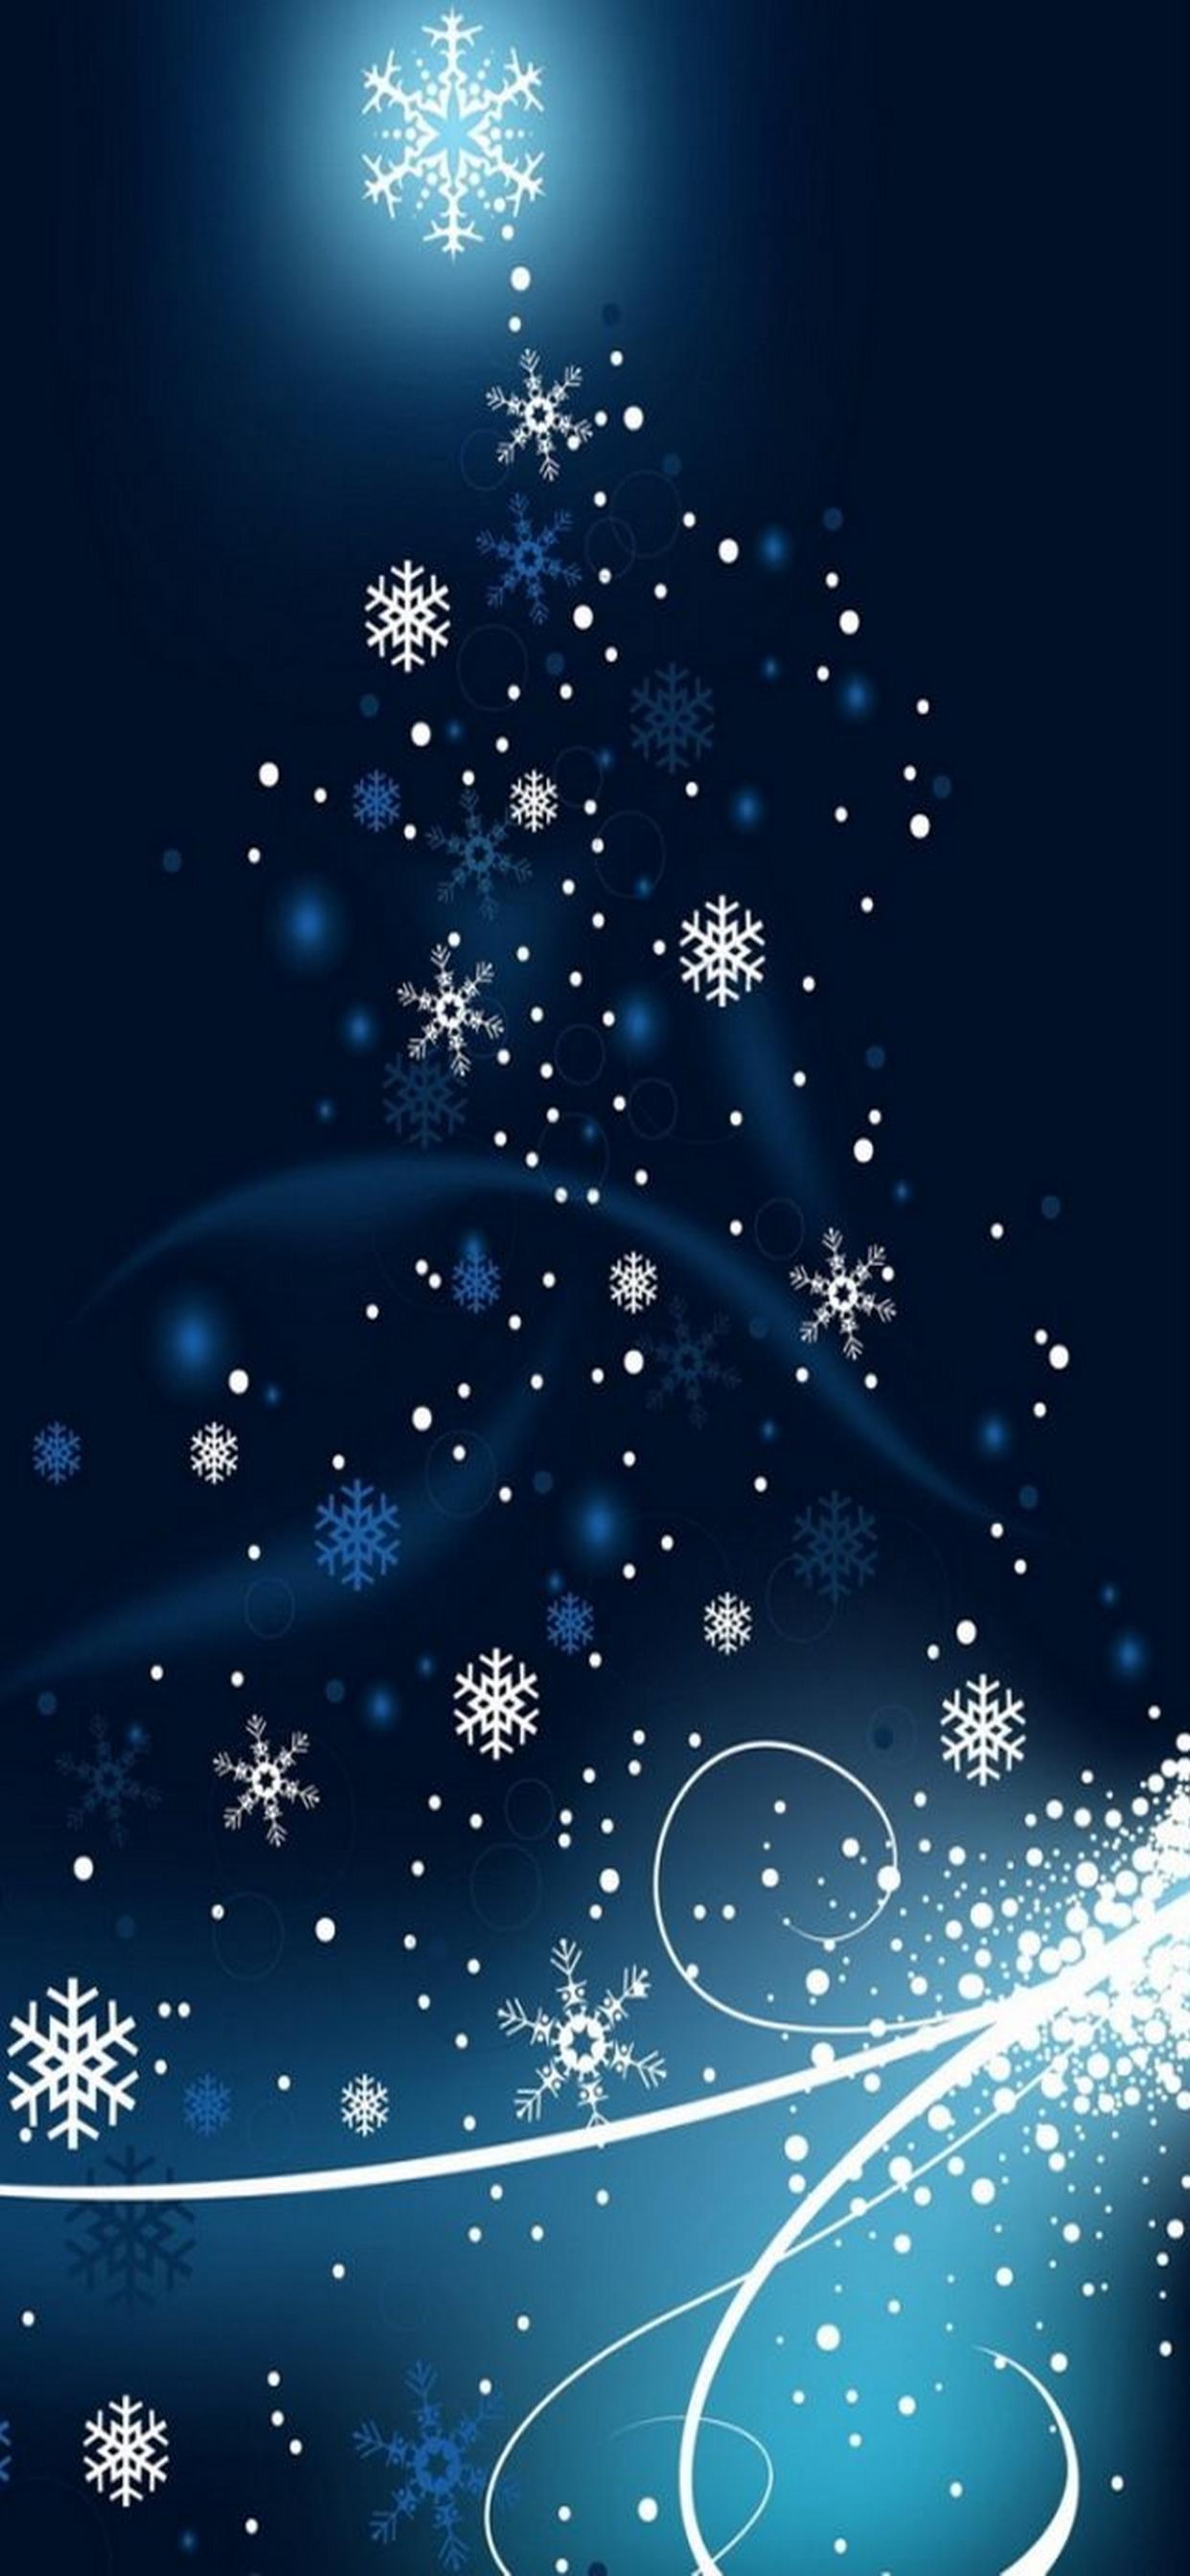 Обои На Телефон Андроид Зима Новый